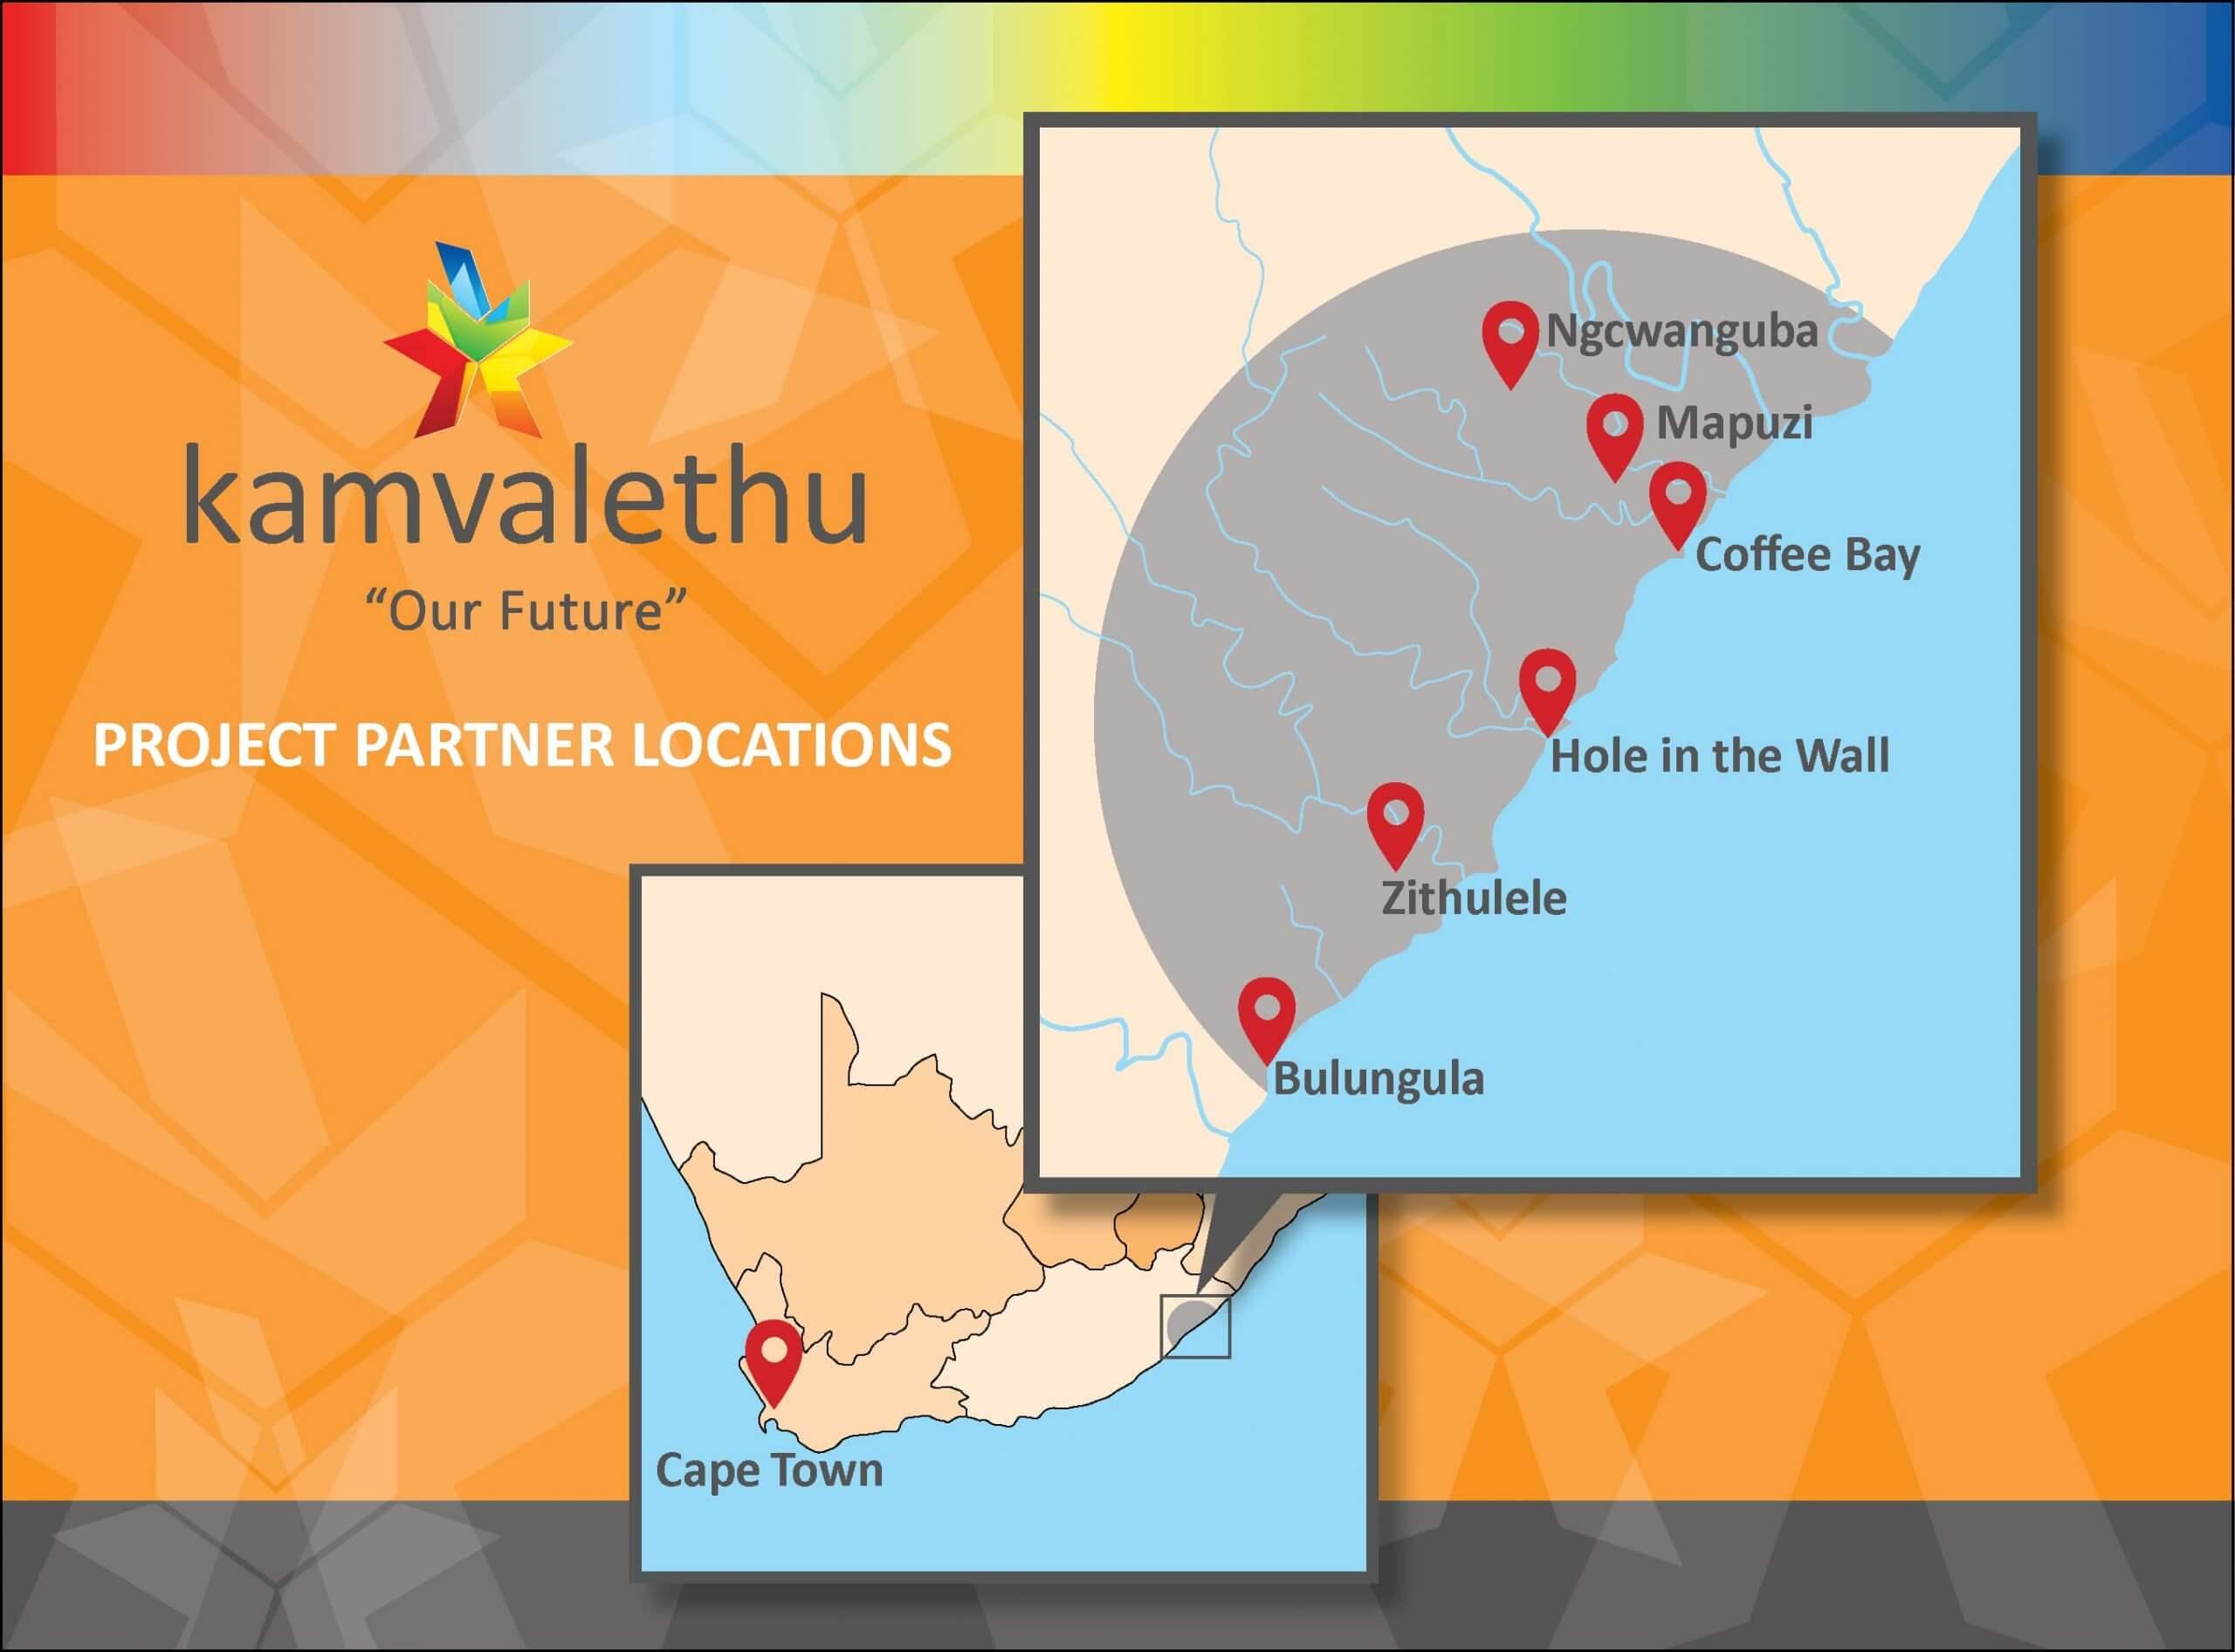 Project Partner Locations